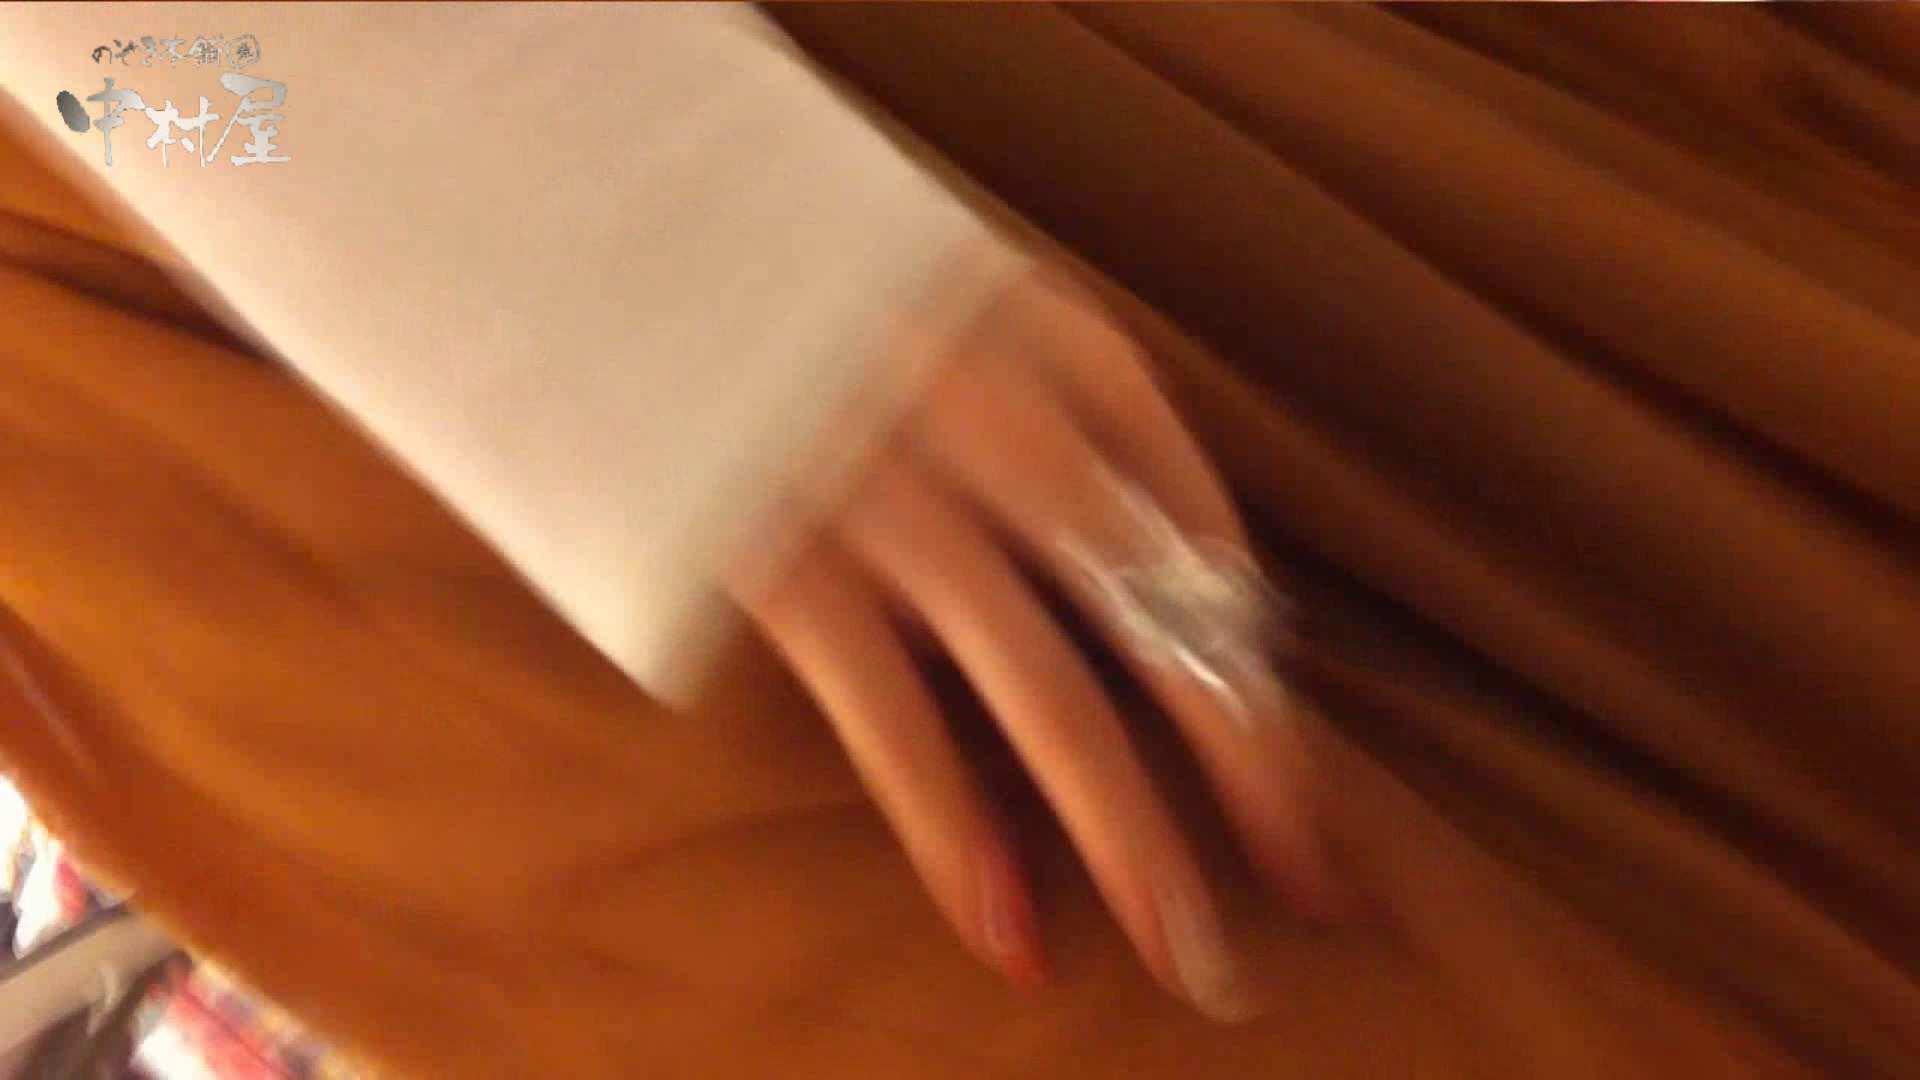 vol.84 美人アパレル胸チラ&パンチラ 帽子オネェさんに胸元アタック! 接写  94連発 60